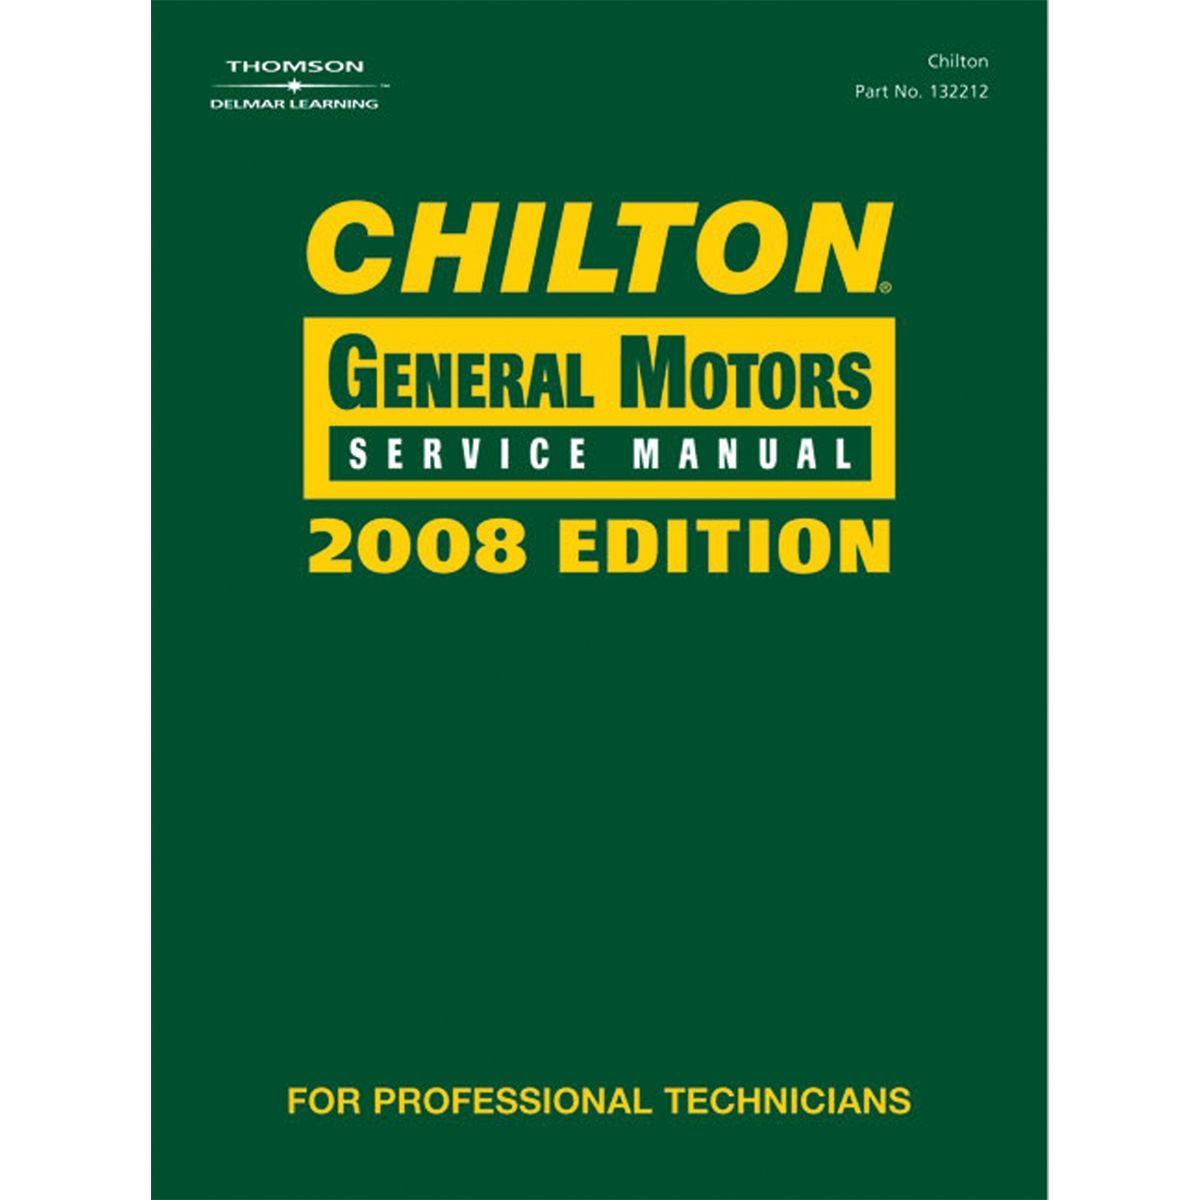 General Motors Service Manual - 2008 Edition Volume 1 & 2